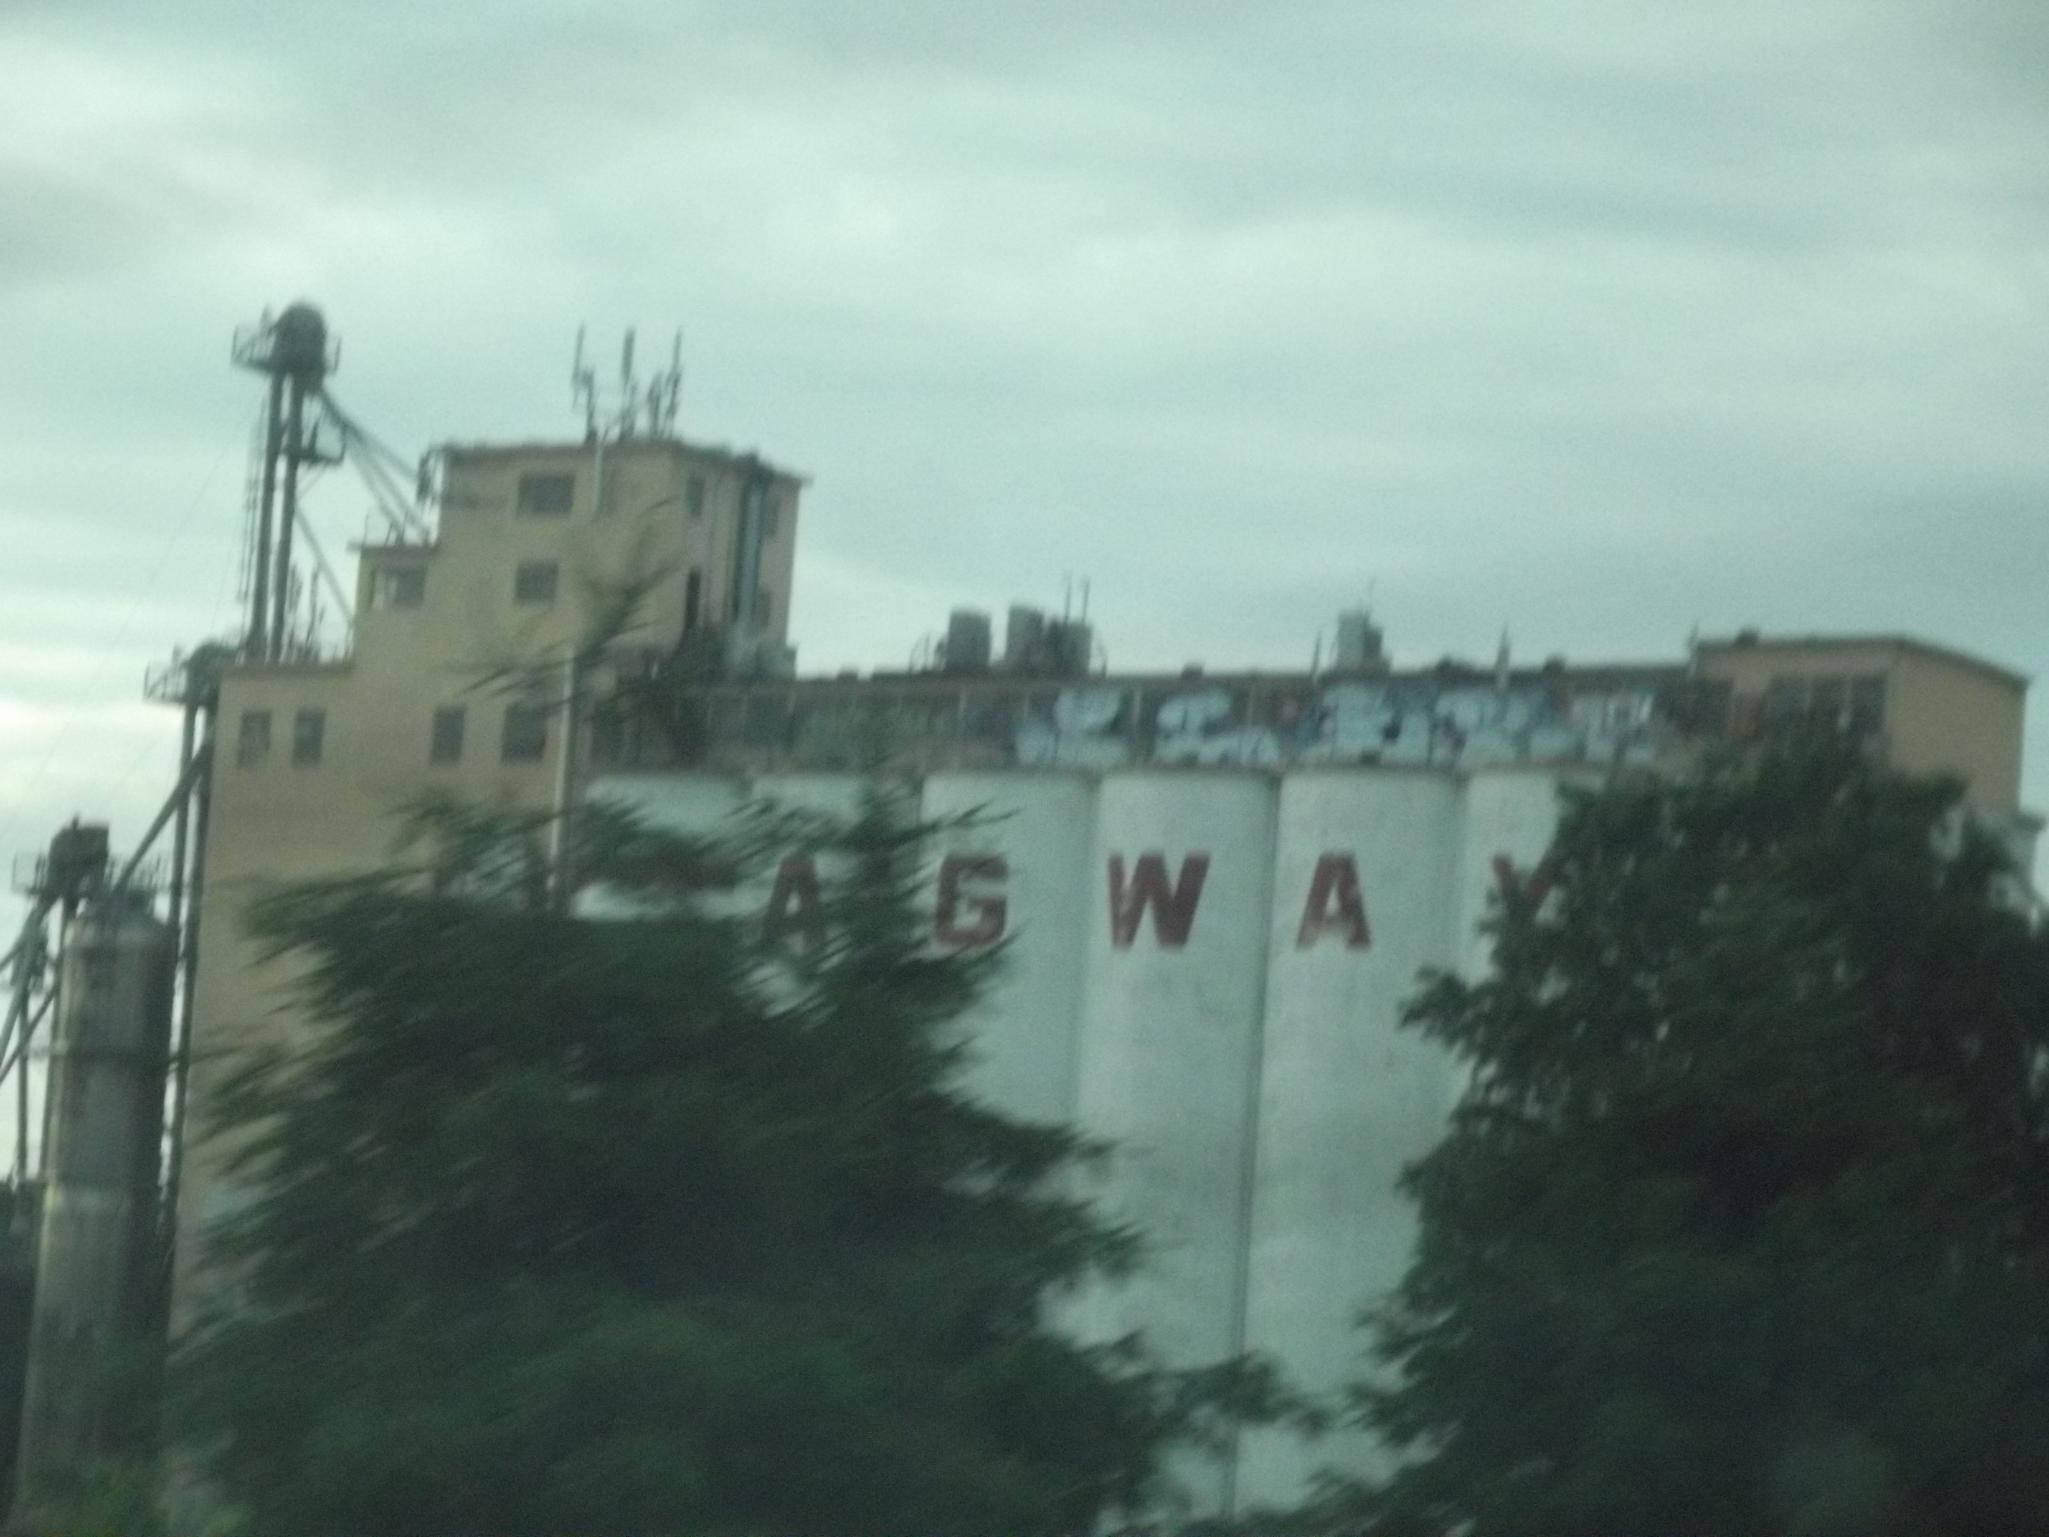 Flip On Agway Factory (New).jpg